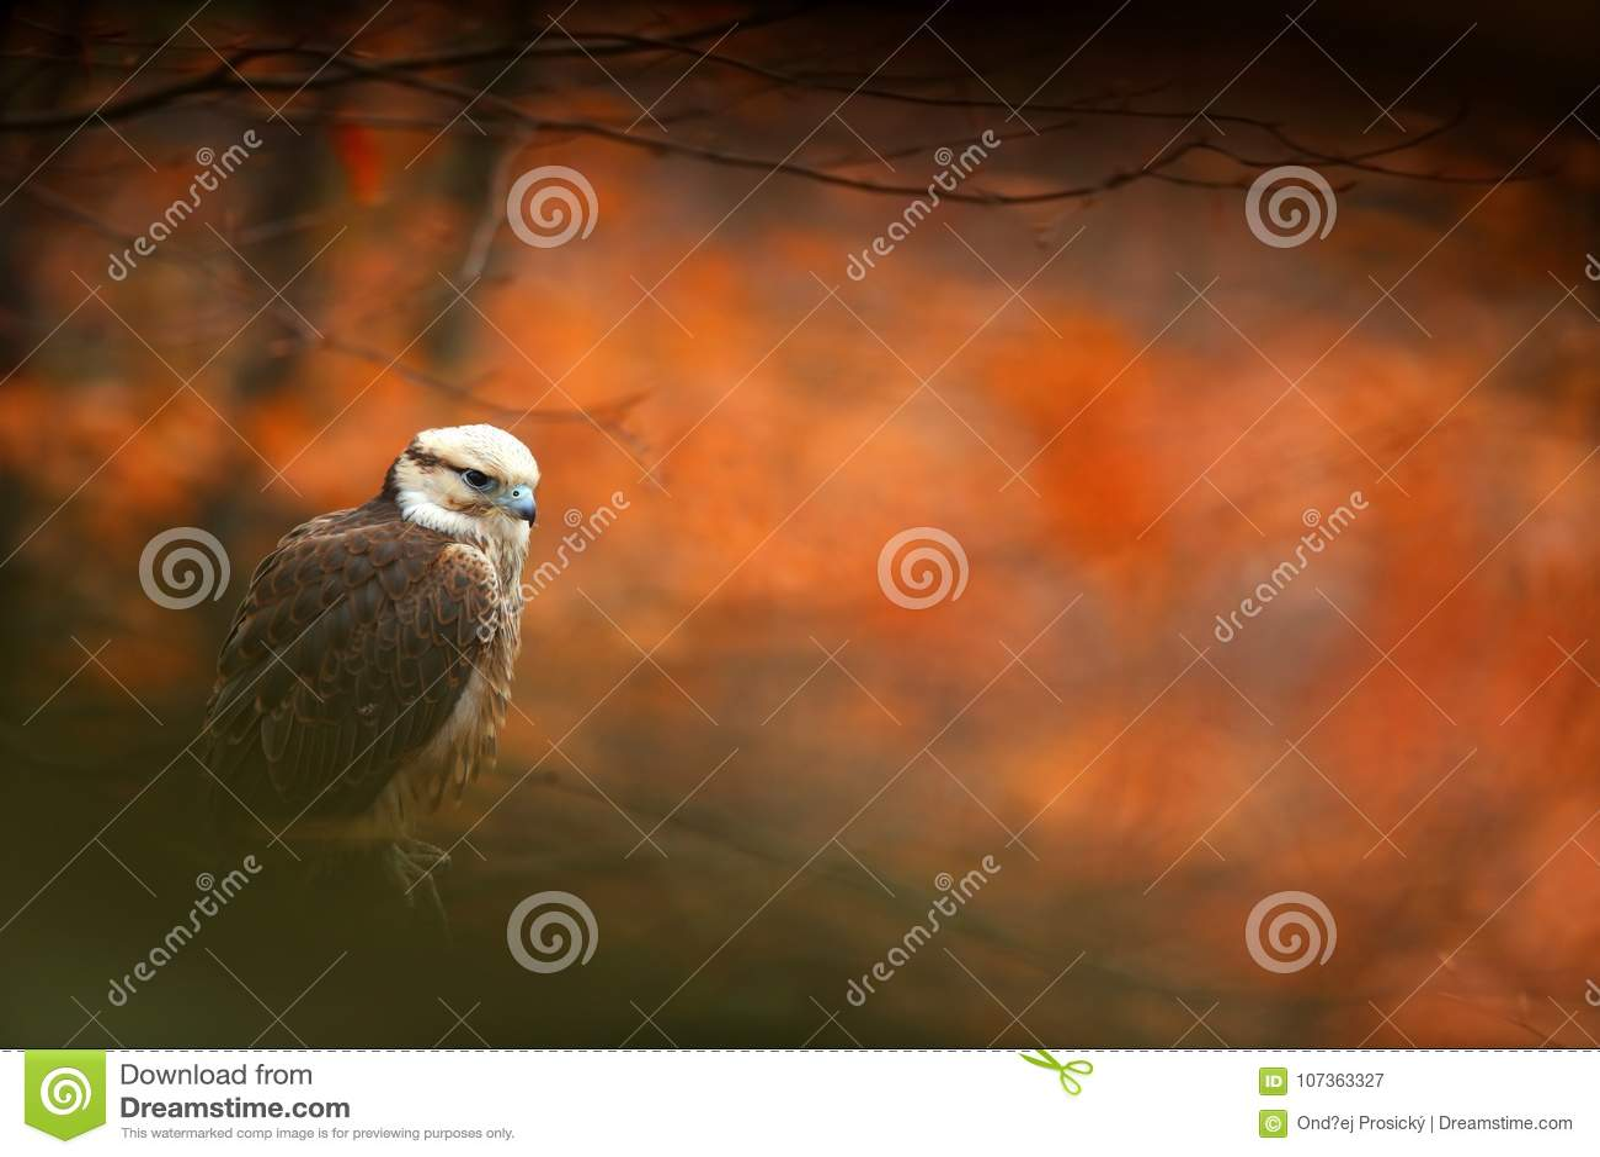 Lanner Falcon, Falco biarmicus, bird of prey sitting on the stone, orange habitat in the autumn forest, rare animal, France